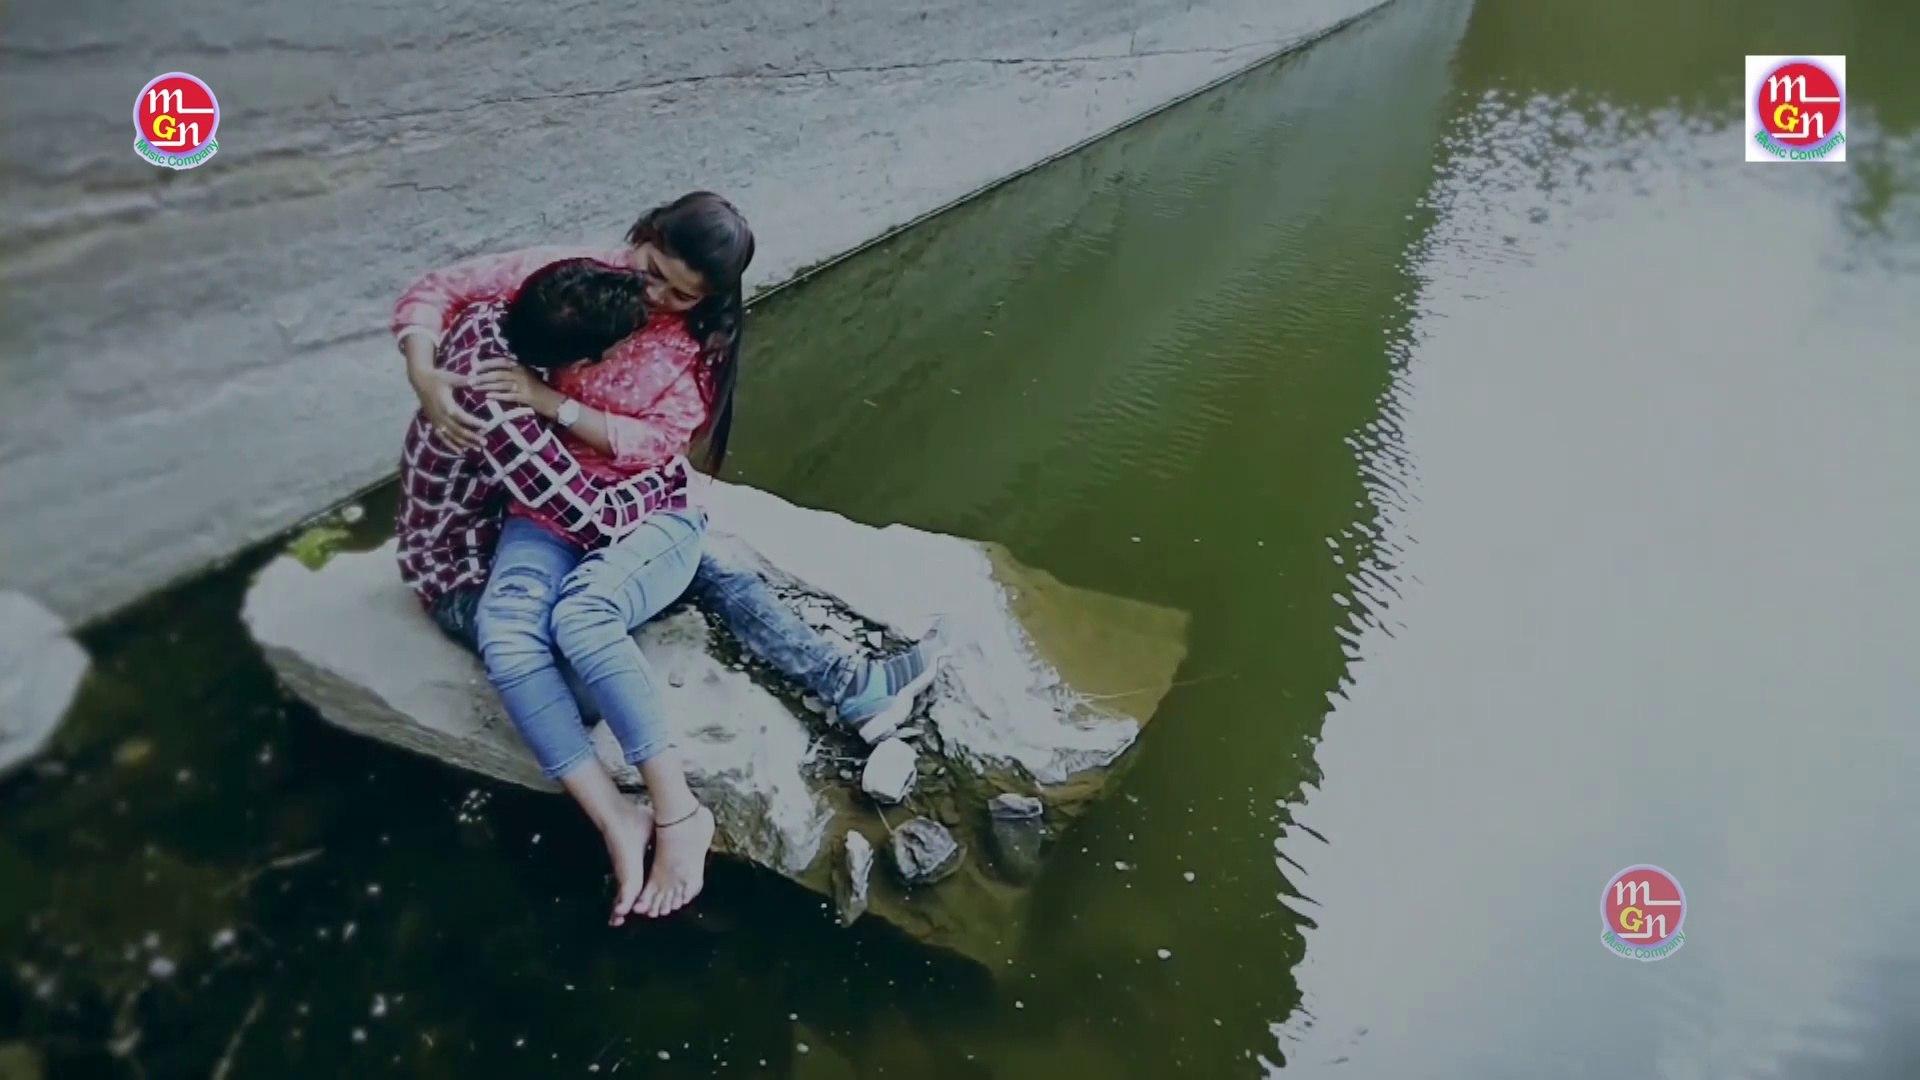 New Hindi Songs 2020 January   Top Bollywood Songs Romantic 2020 January   Best INDIAN Songs 2020#Ne